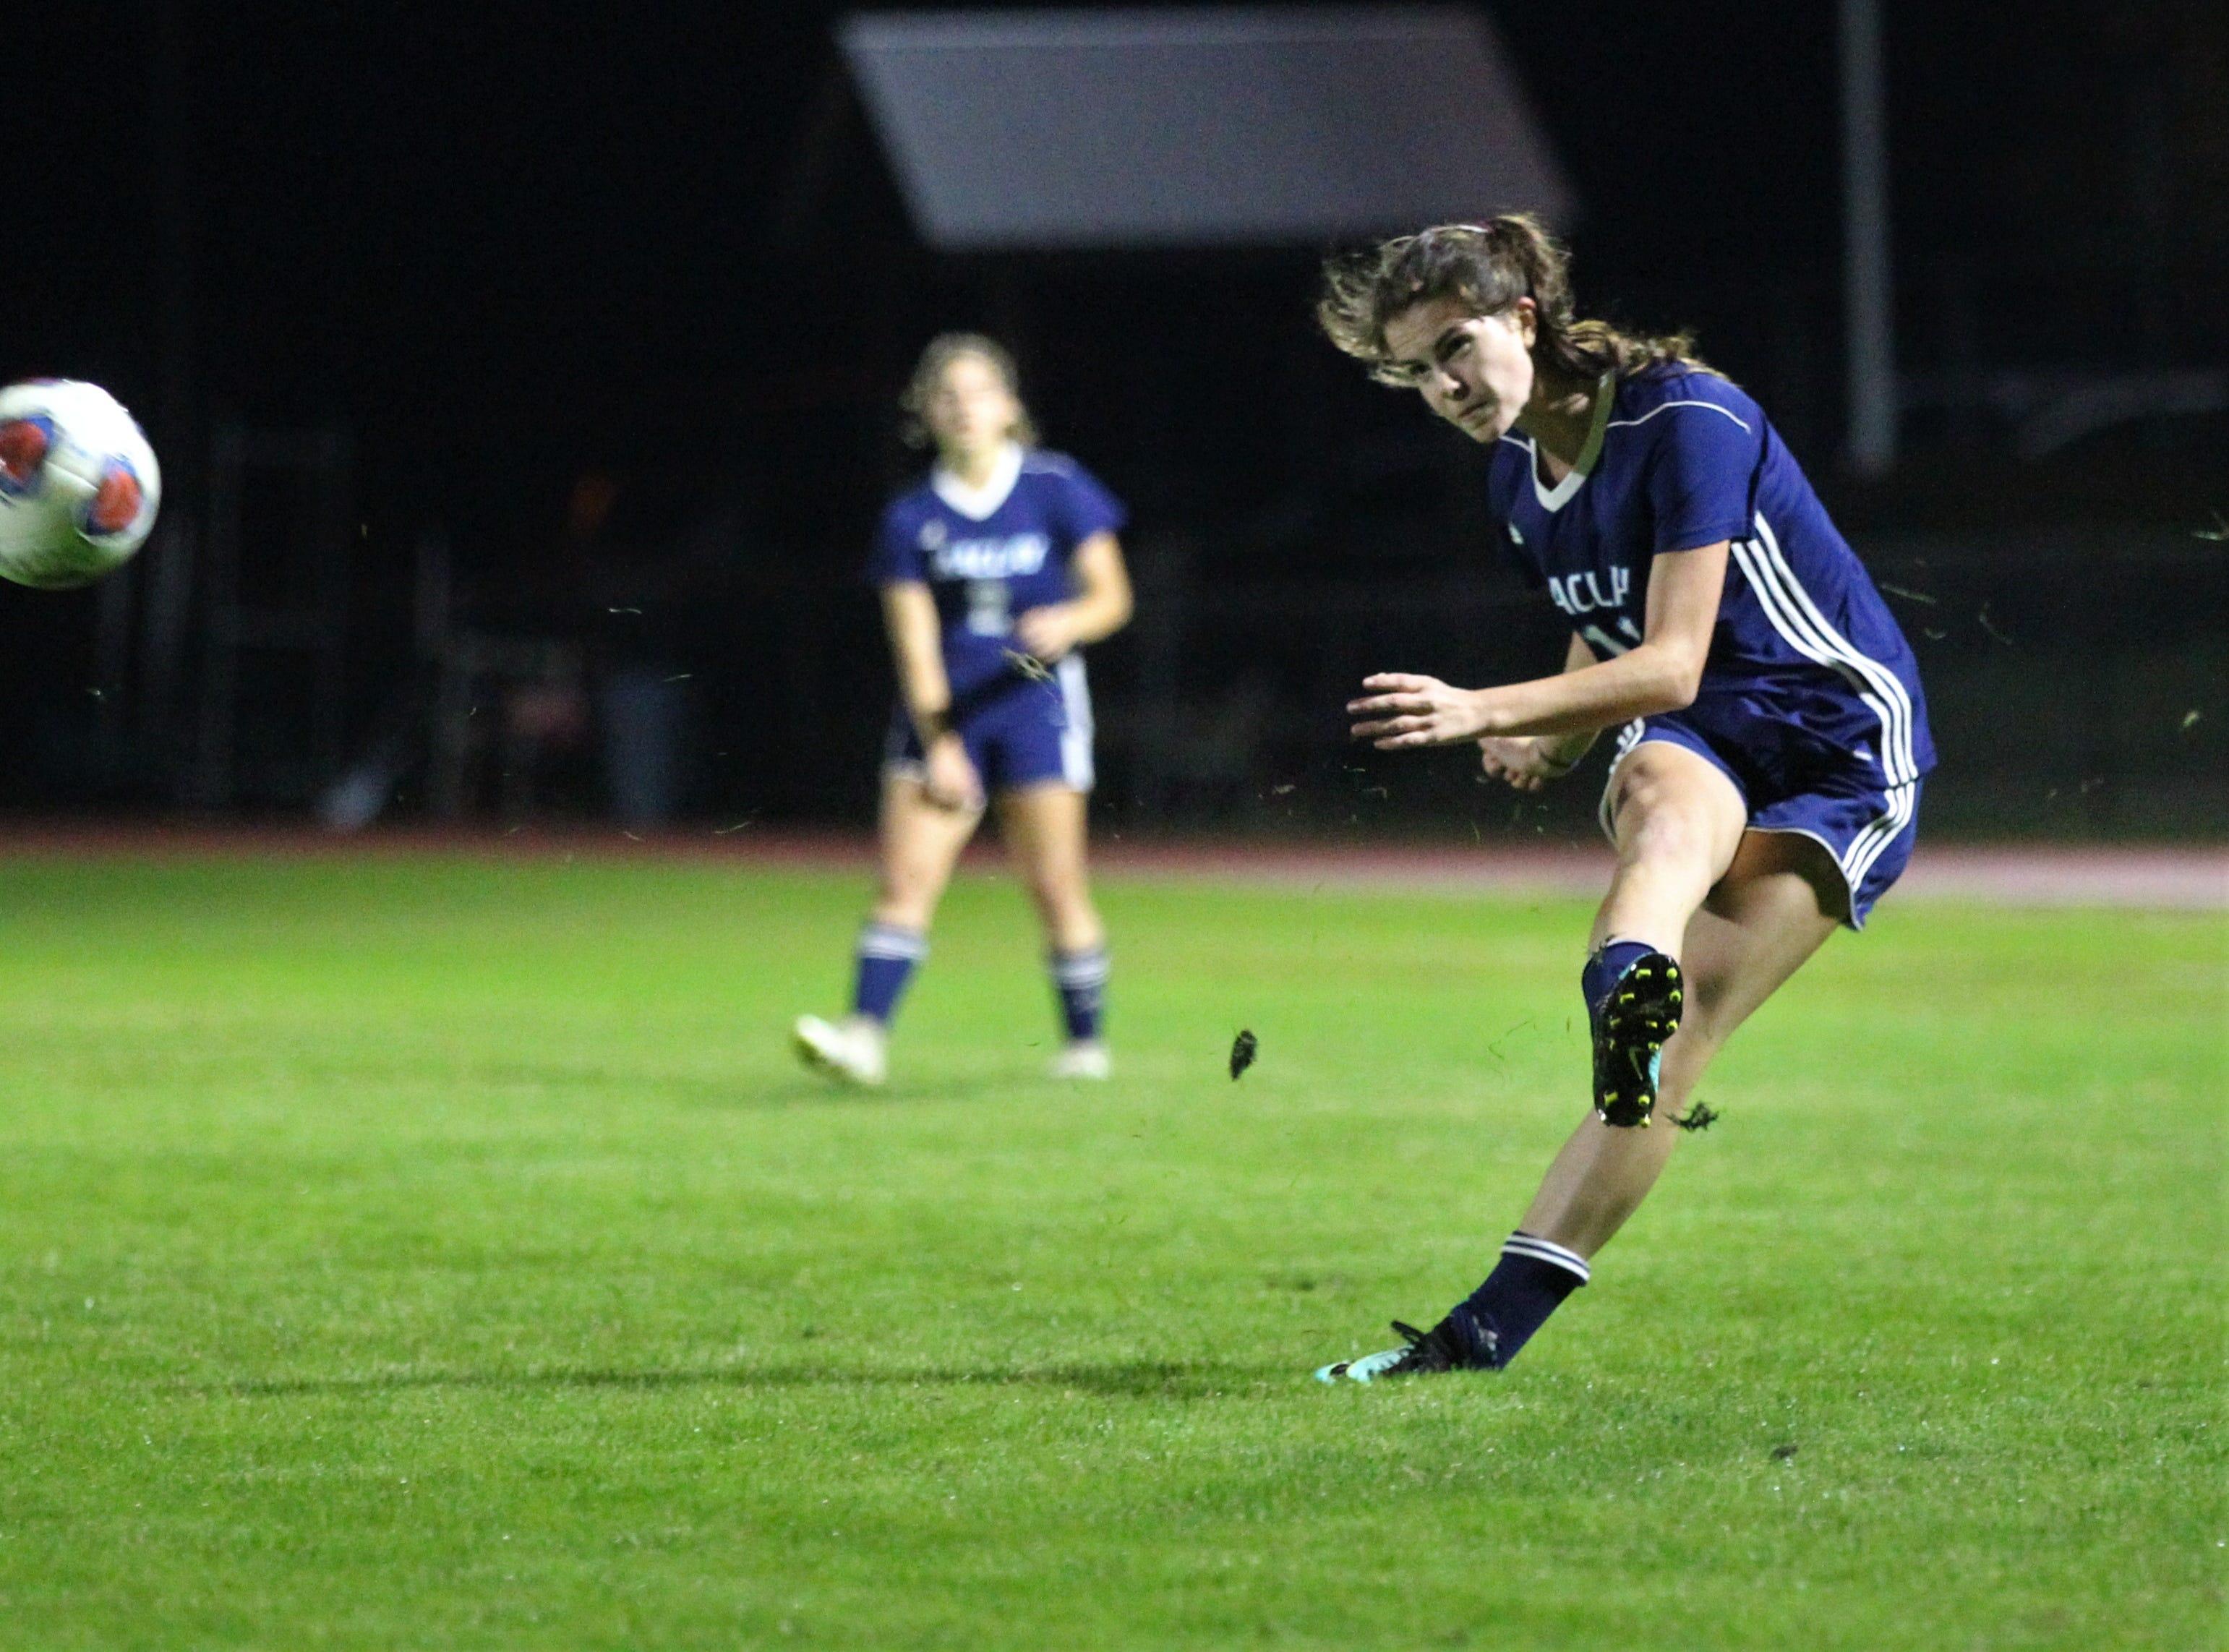 Maclay won 3-0 at home against Florida High on Jan. 8, 2019.